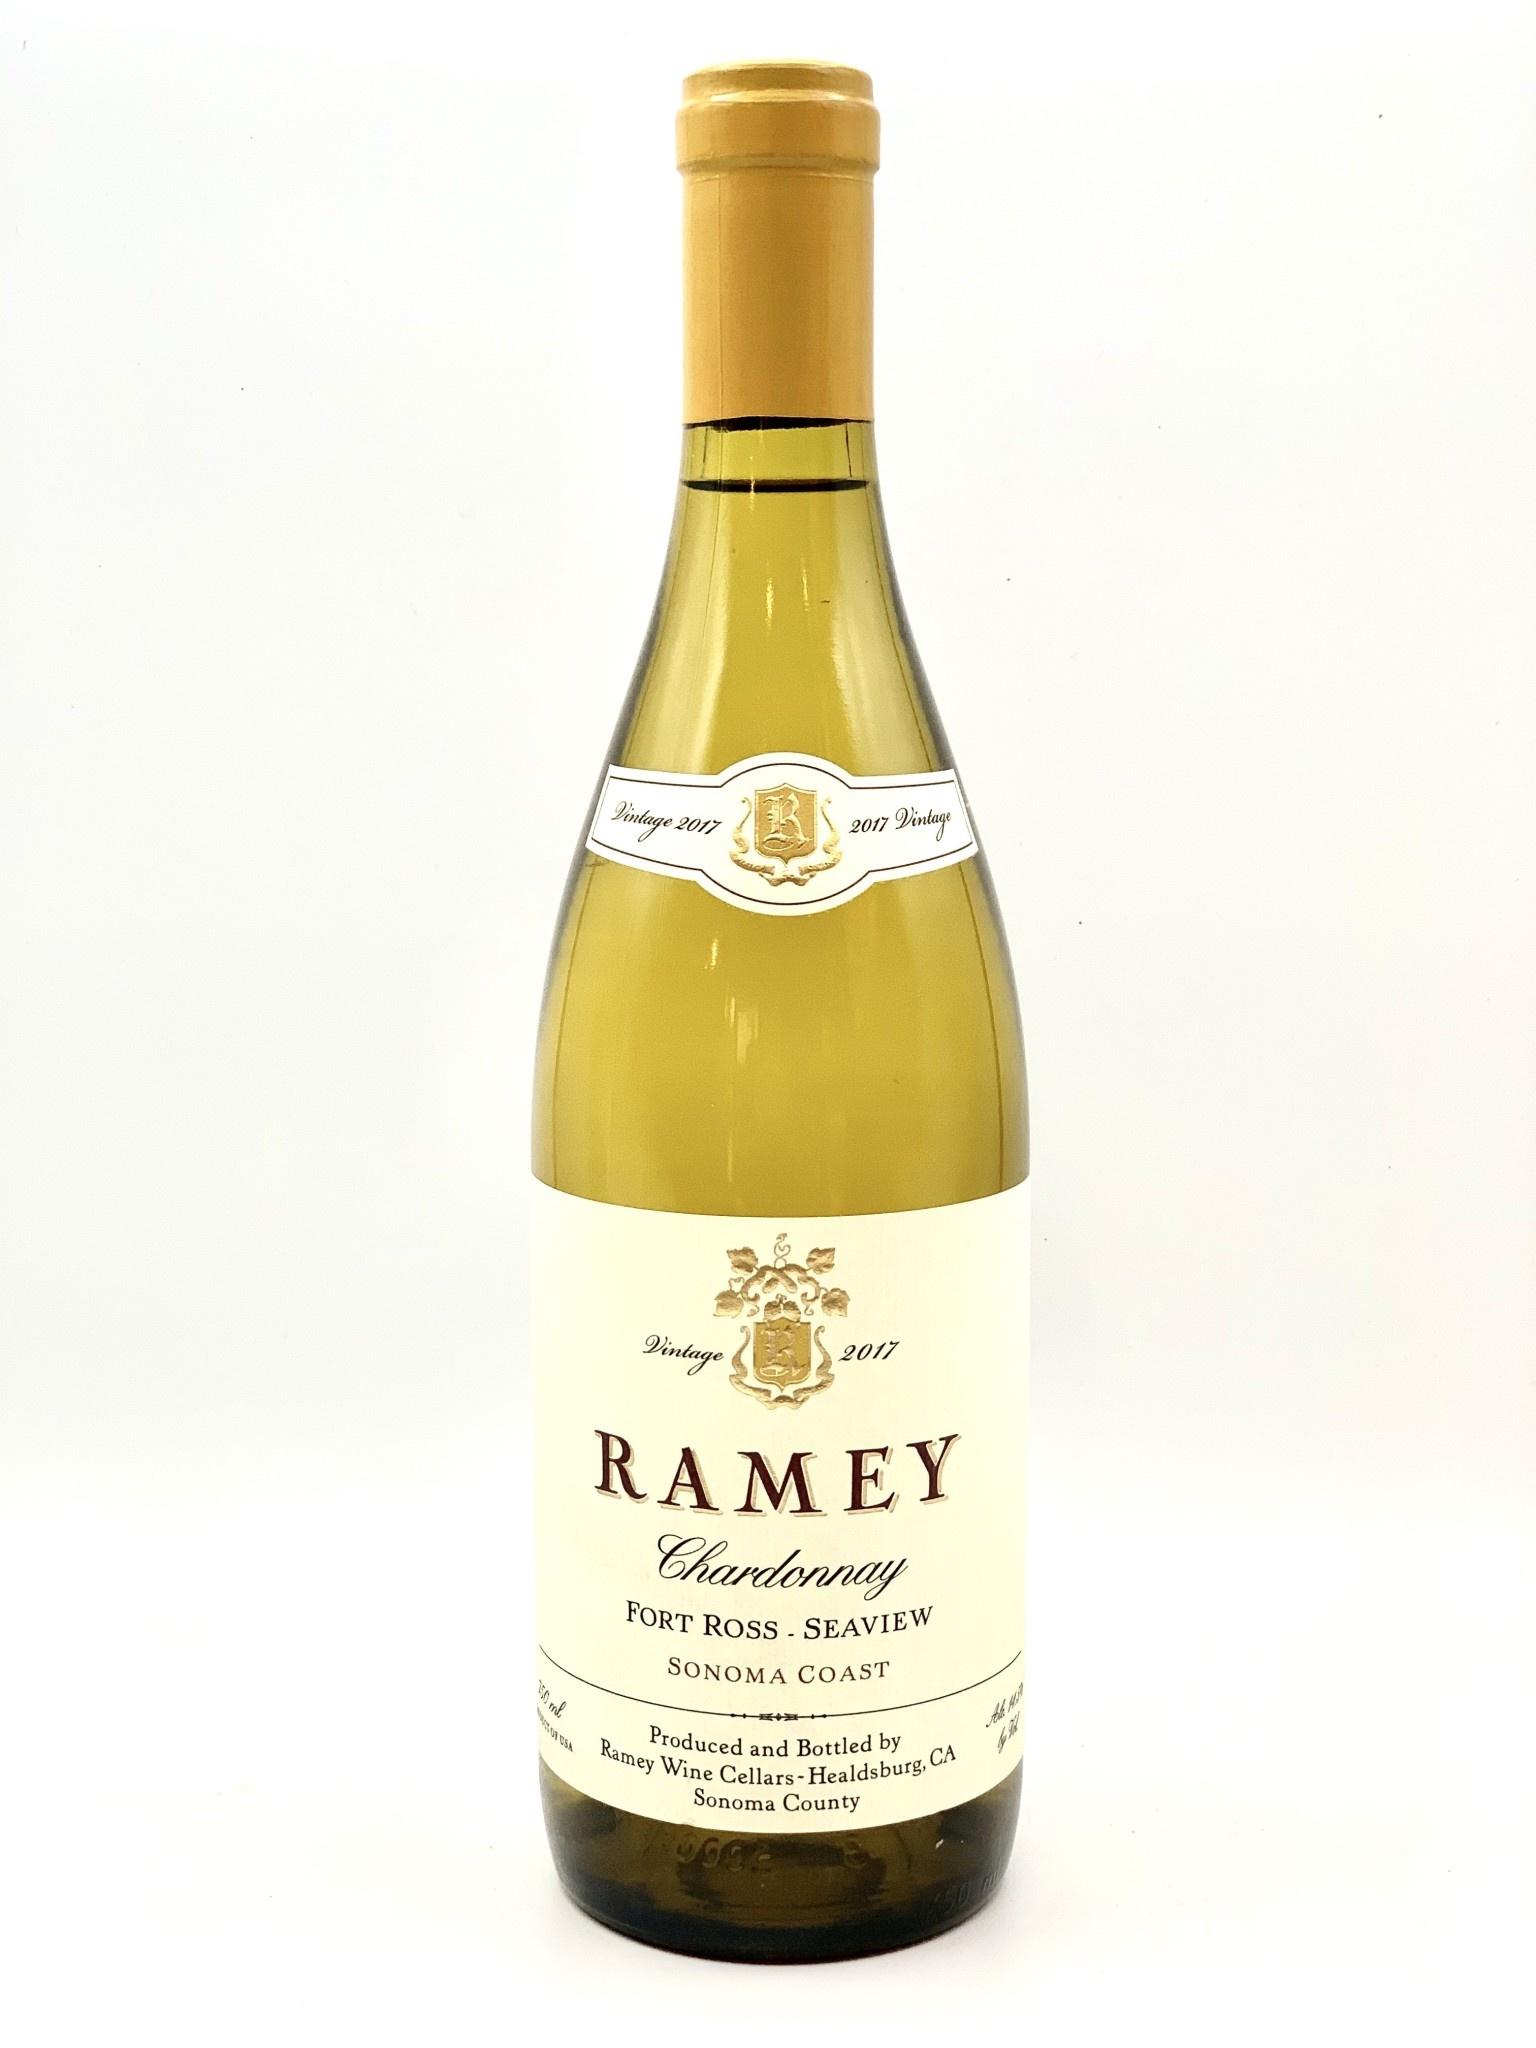 Sonoma Coast Chardonnay 2017 Ramey Wine Cellars 750ml